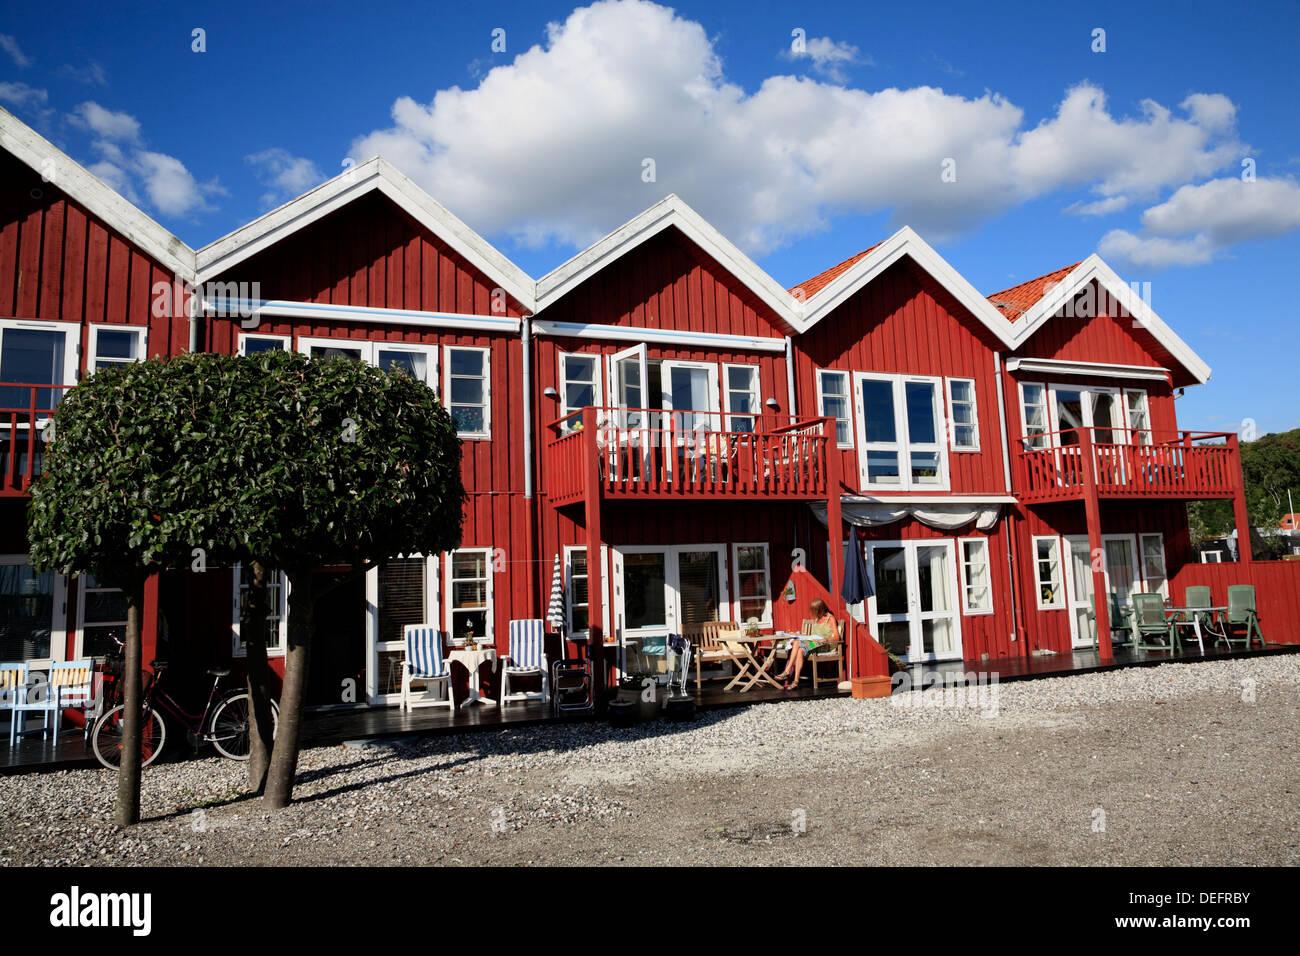 Holliday houses at Ebeltoft harbor, Djursland, Jutland, Denmark, Scandinavia, Europe - Stock Image